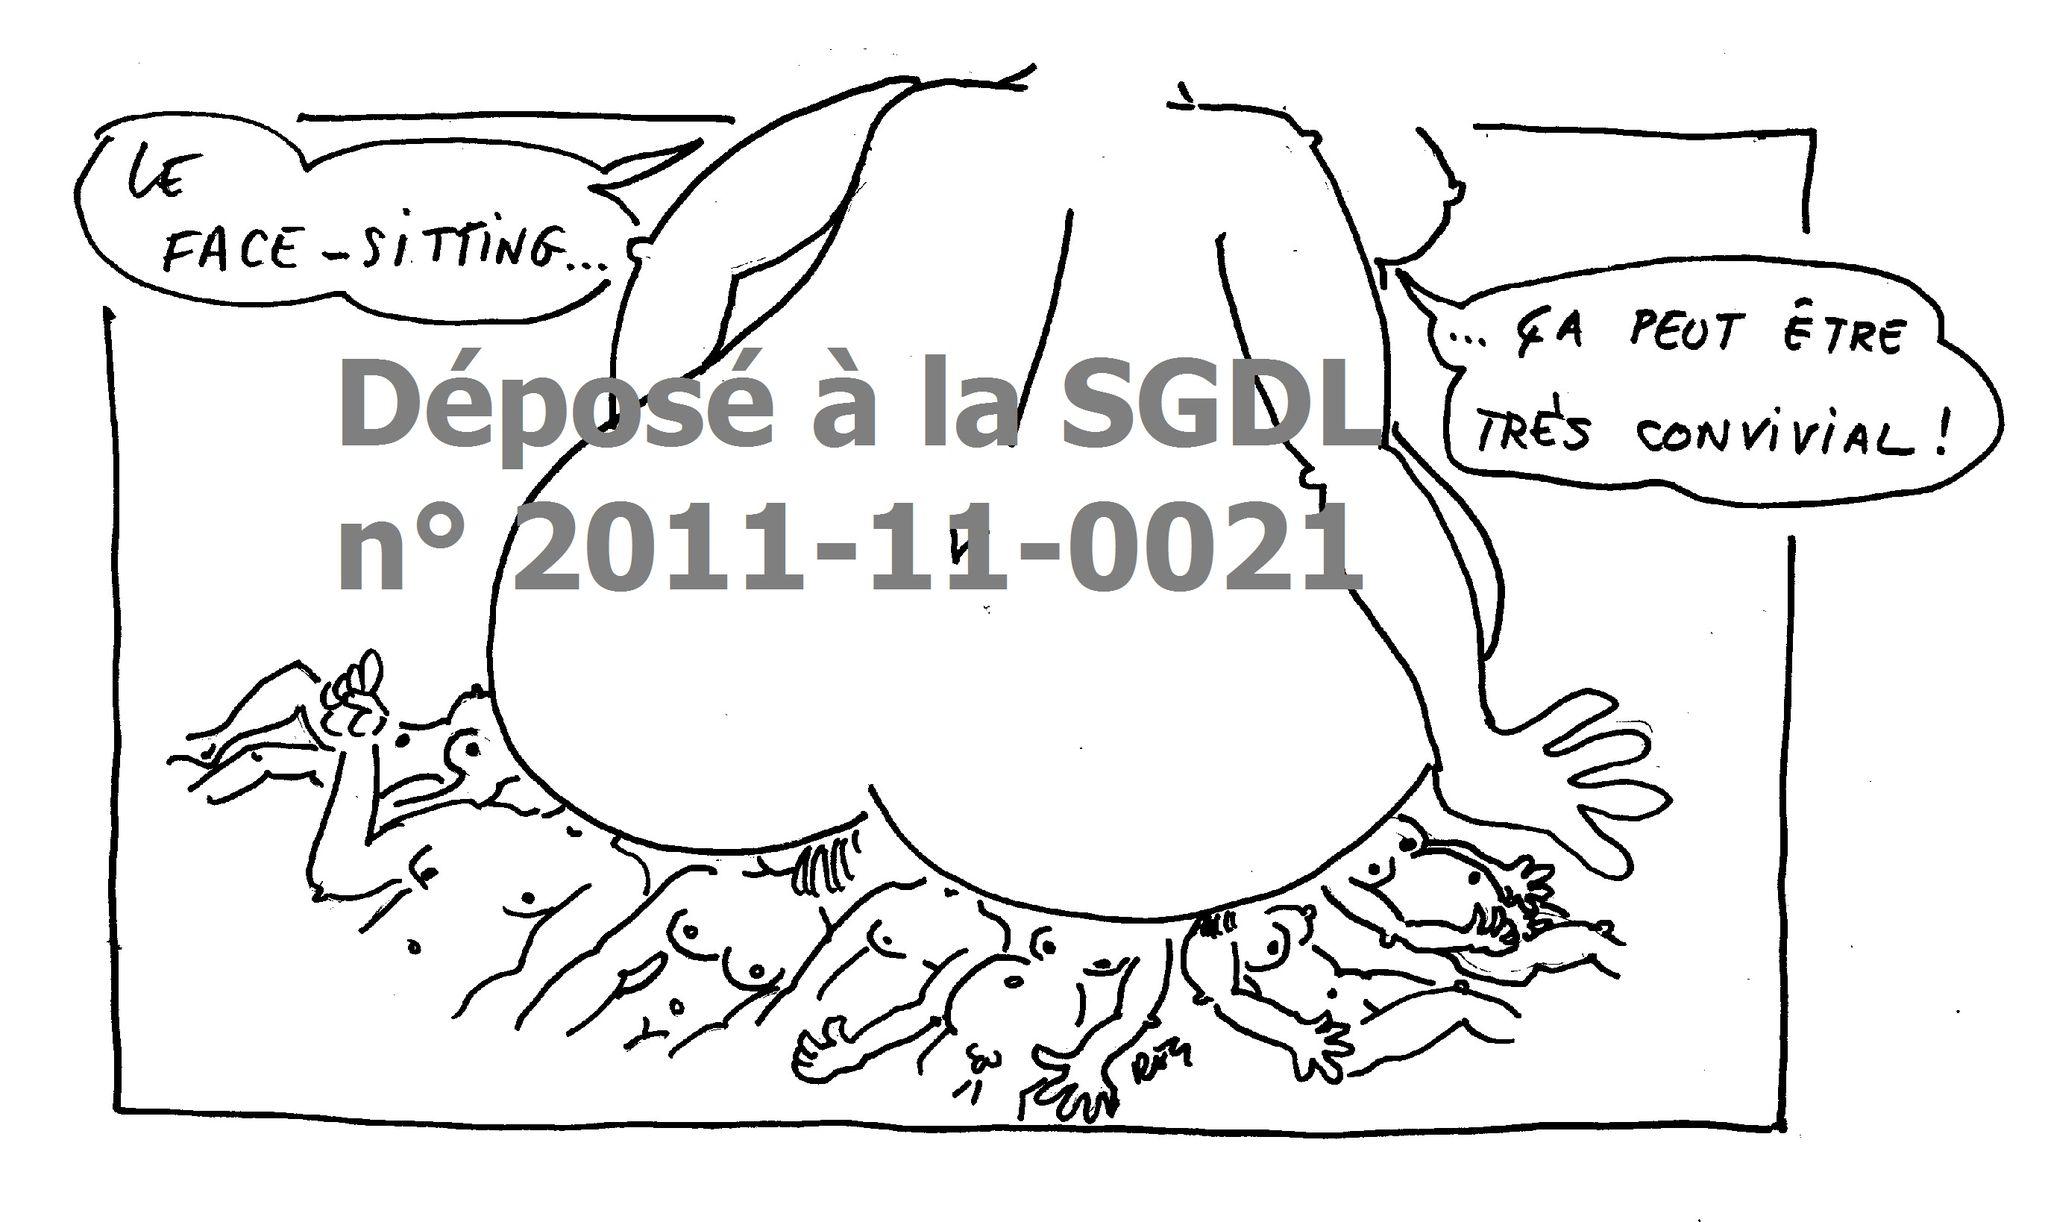 FaceSitting_SGDL